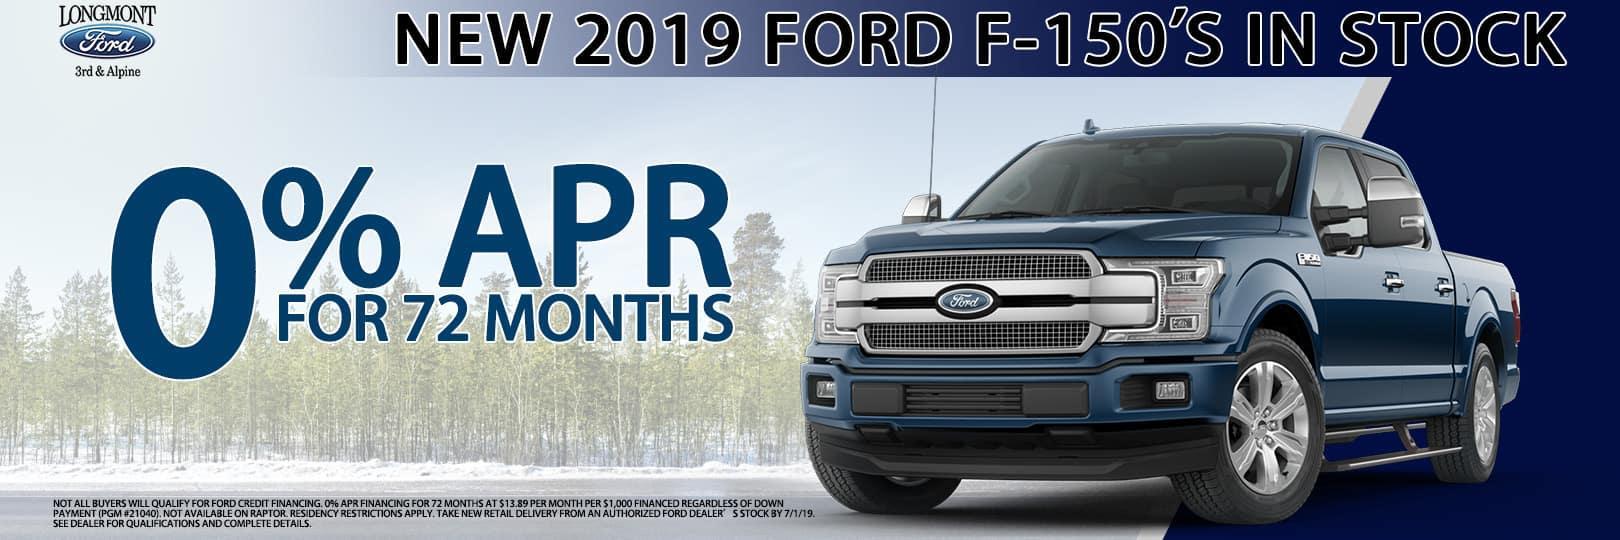 Ford Dealership Denver >> Longmont Ford Longmont Co New And Used Ford Dealer